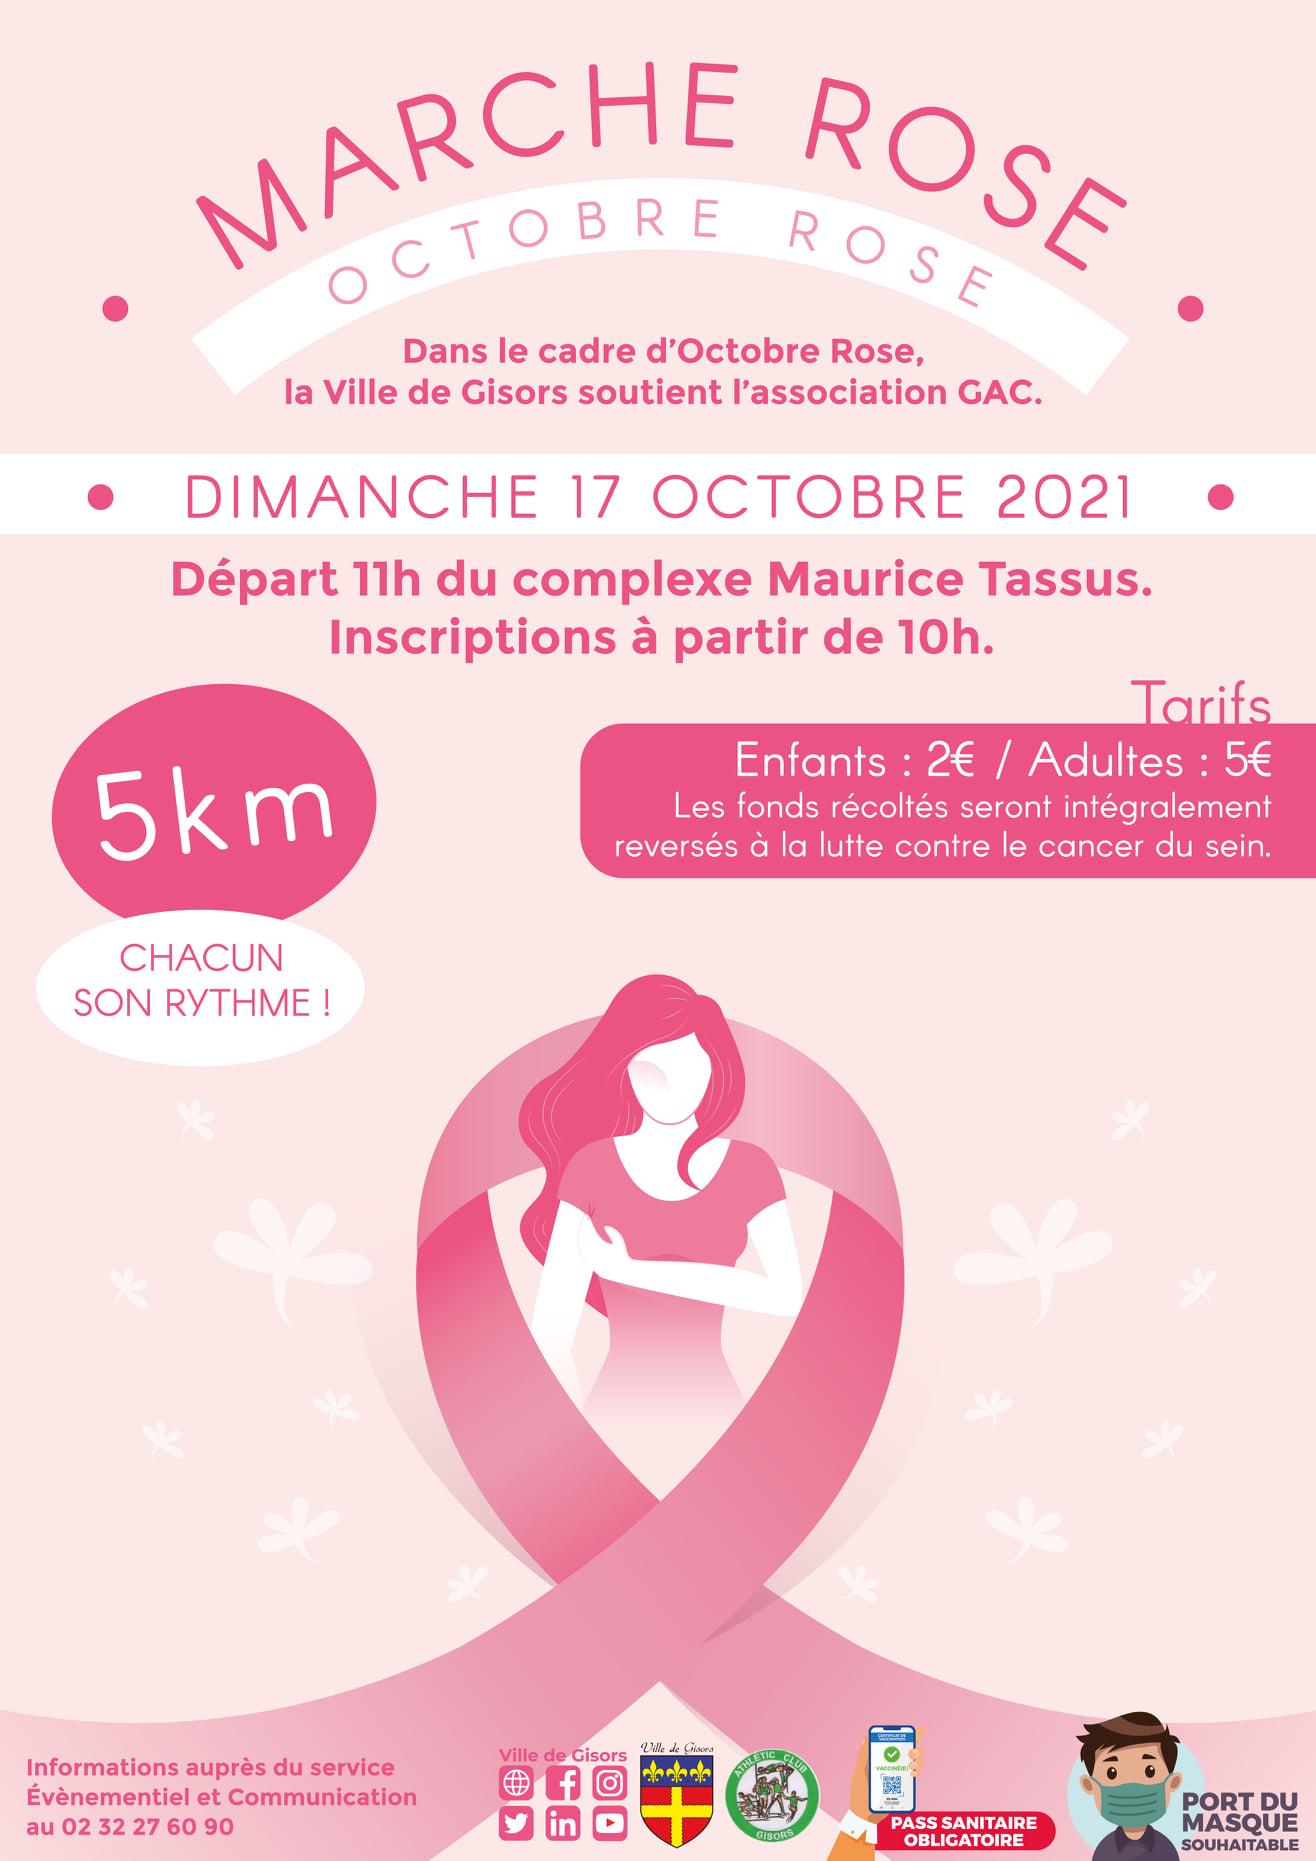 Marche octobre rose Gisors 17 octobre 2021